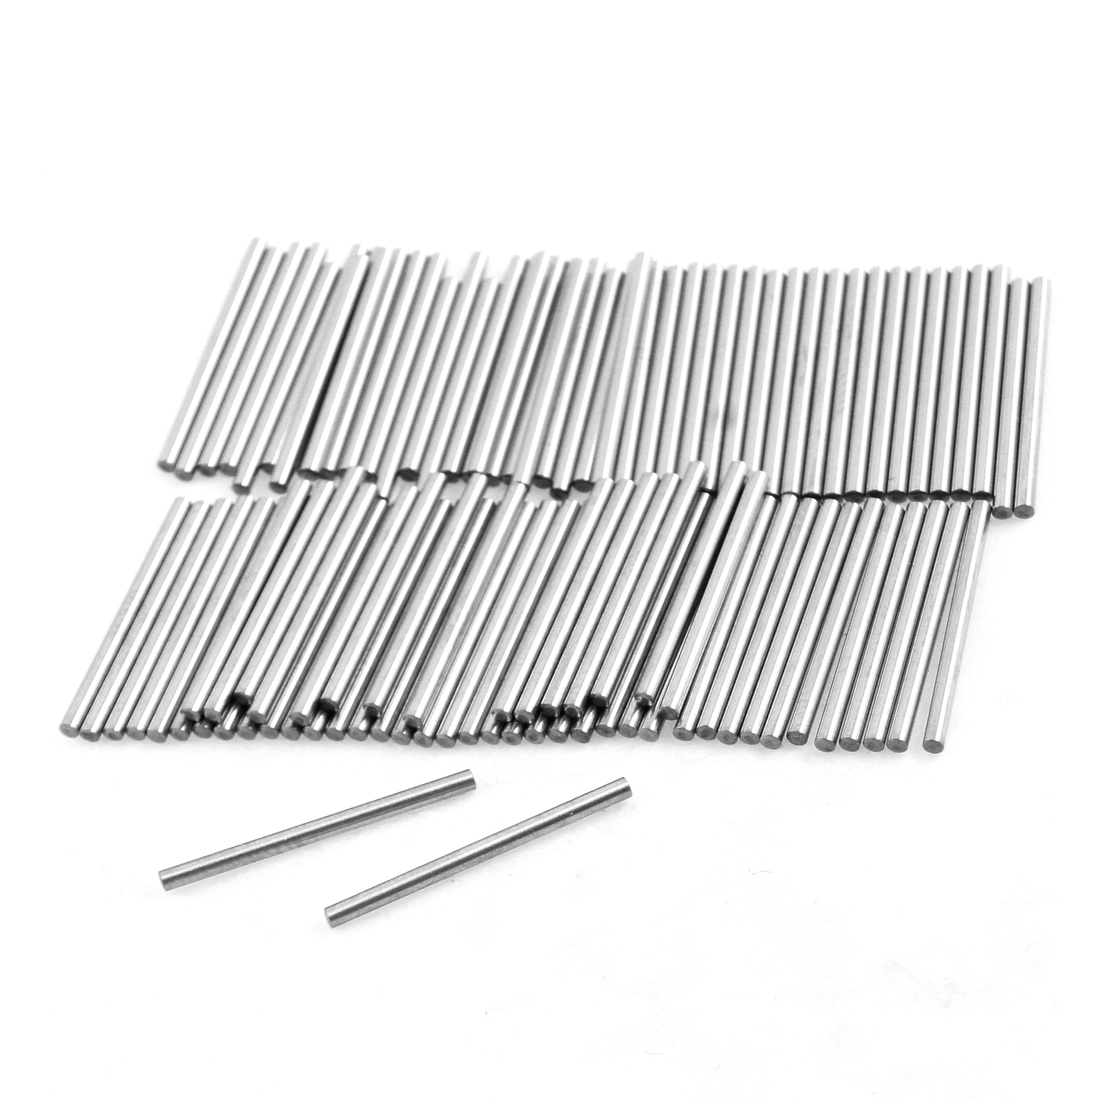 100 Pcs Stainless Steel 1.05mm x 15.8mm Dowel Pins Fasten Elements